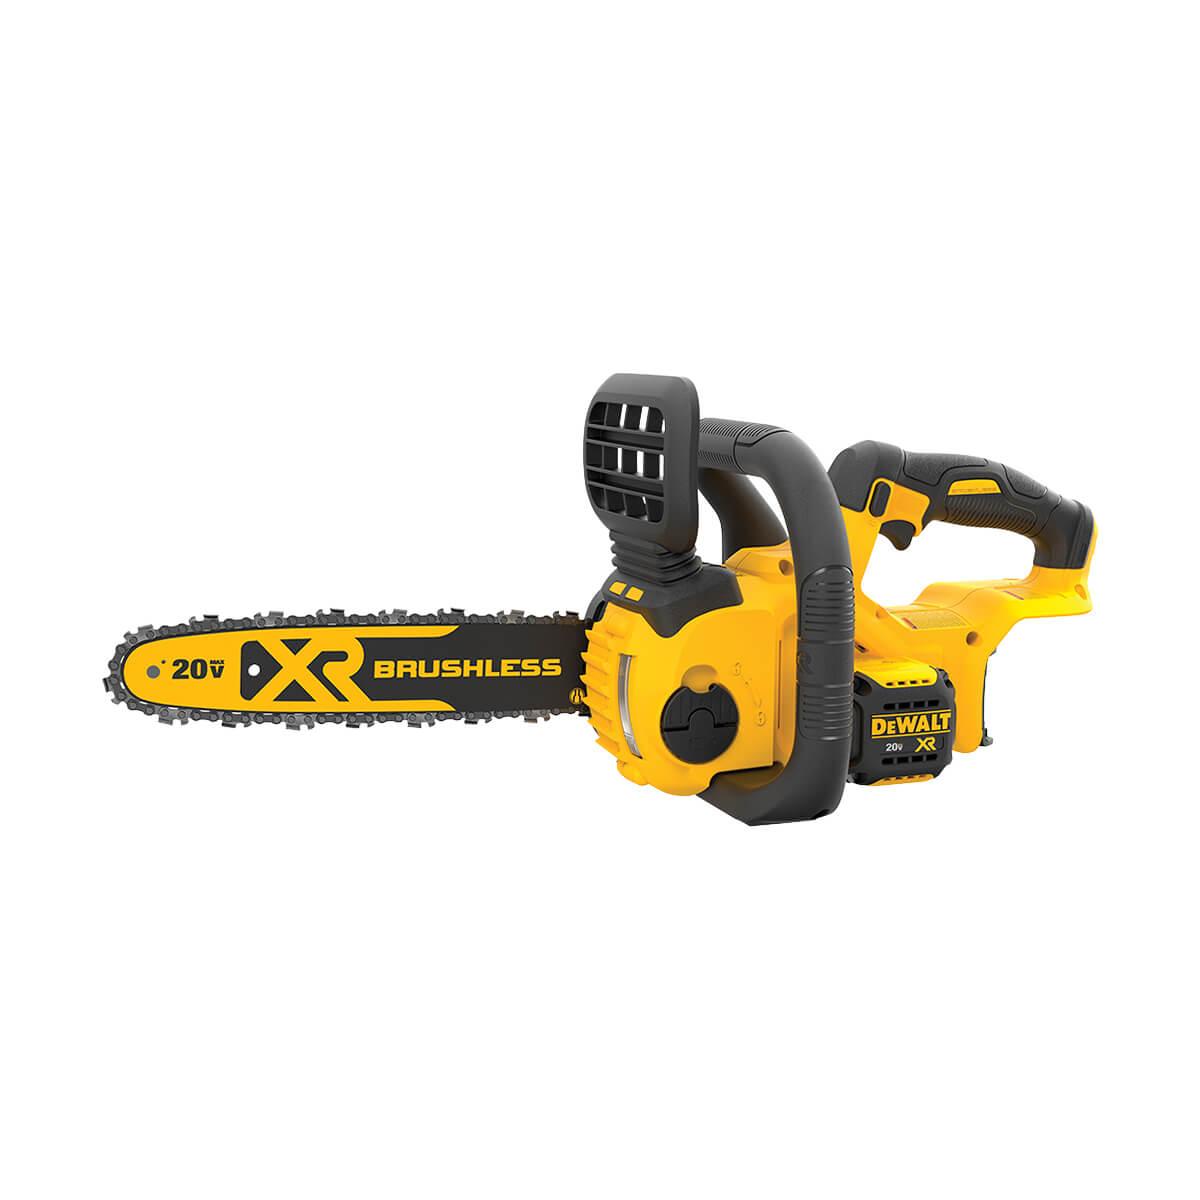 DeWalt 20V Max Brushless Chainsaw - 12 in